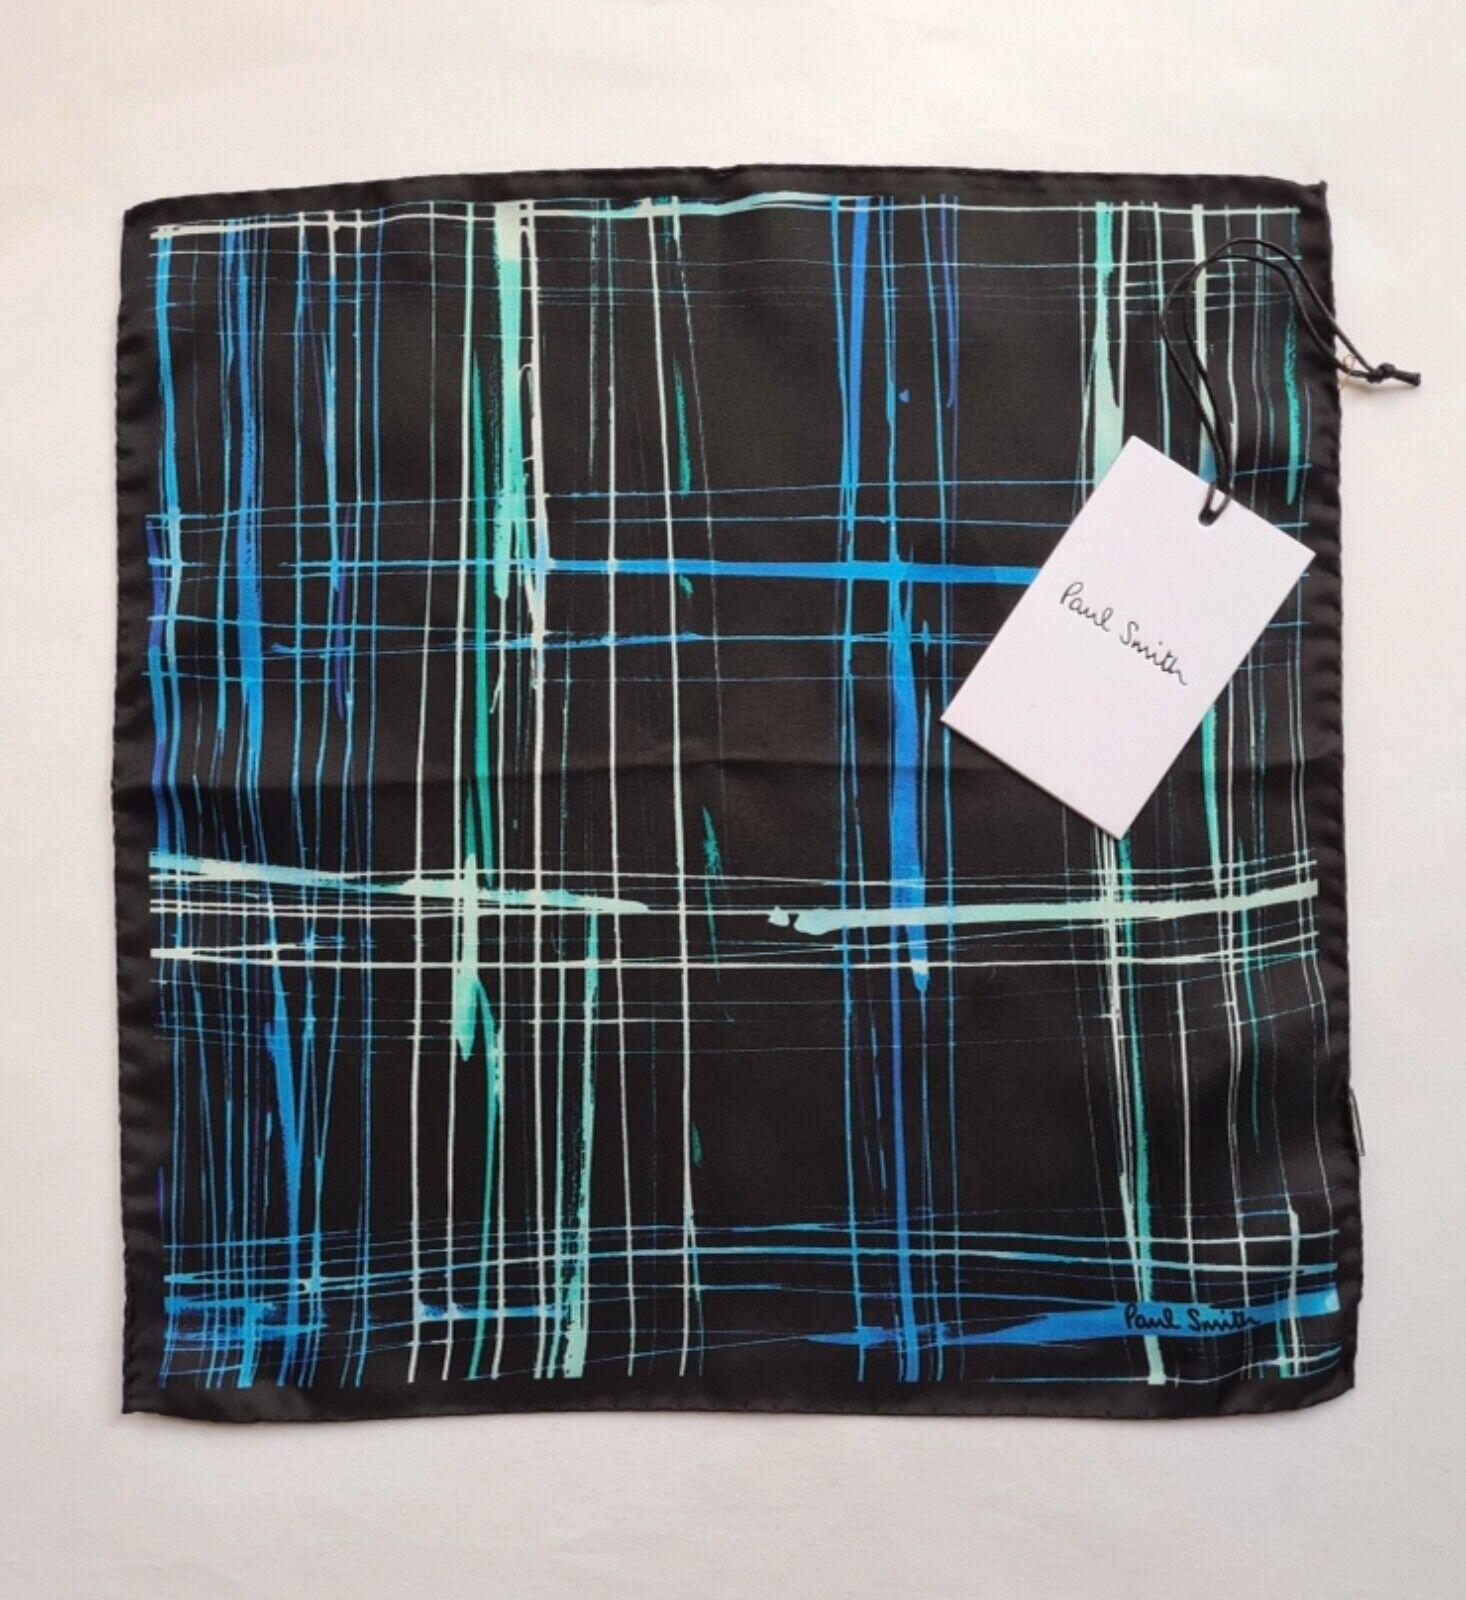 "Paul Smith Pocket Square ""Scribble Check"" Print 100% Silk"